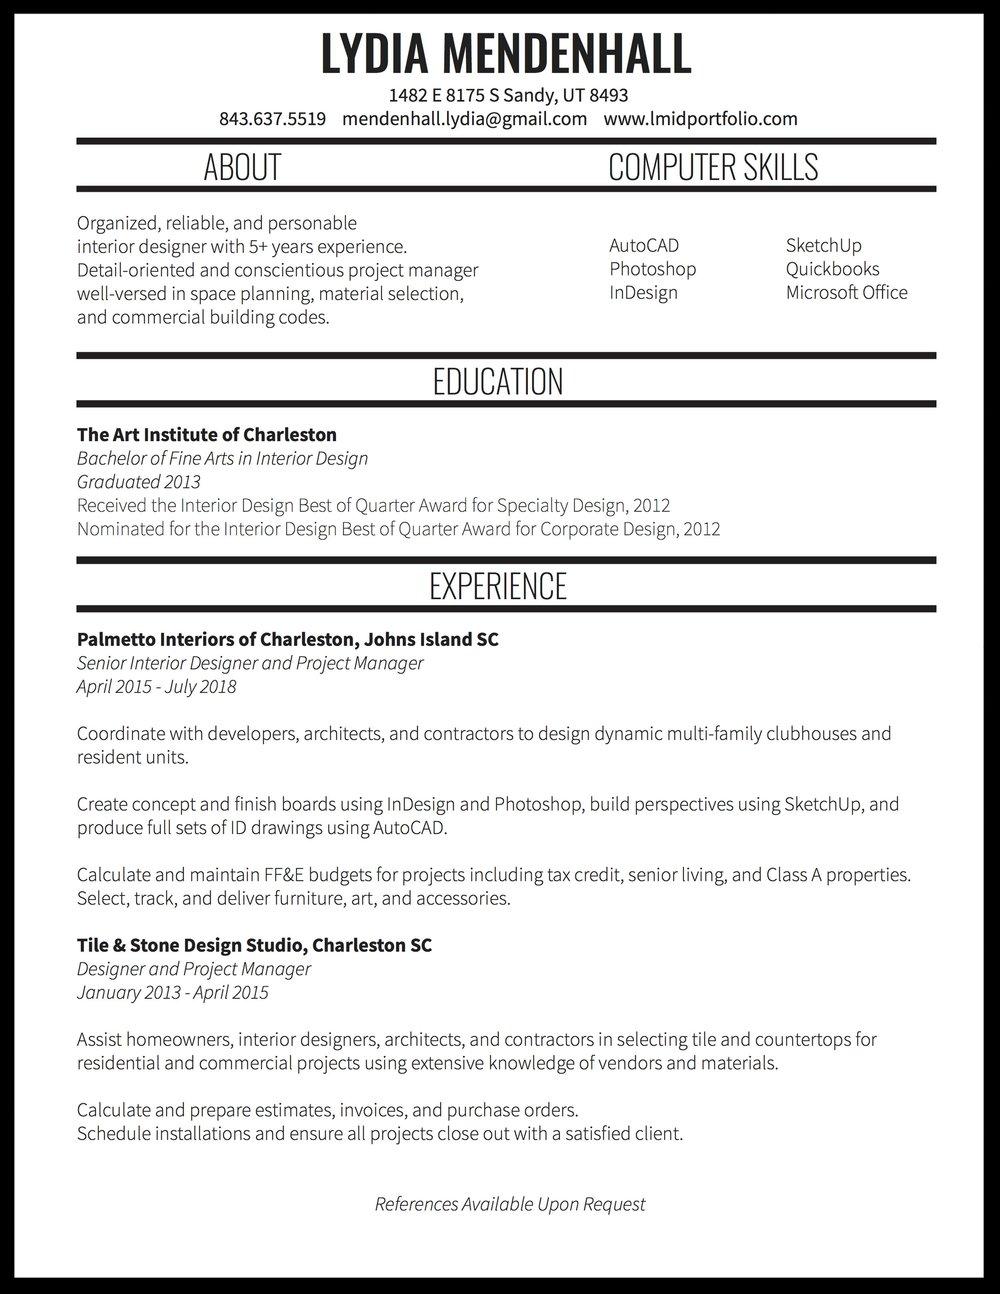 Resume Lydia Mendenhall